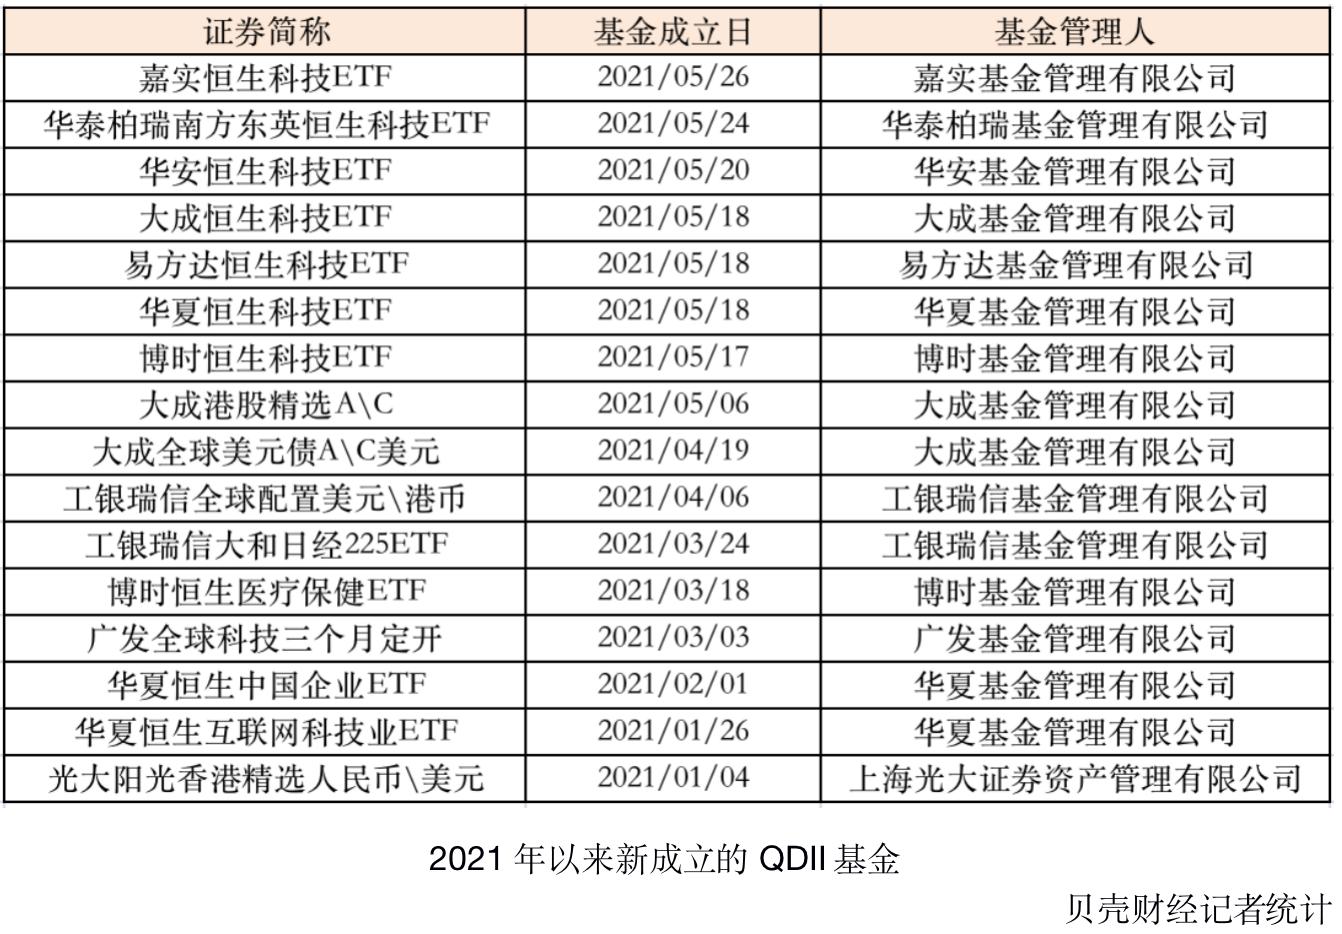 QDII年内4次扩额:公募一哥放宽限购 海外投资大年来了?